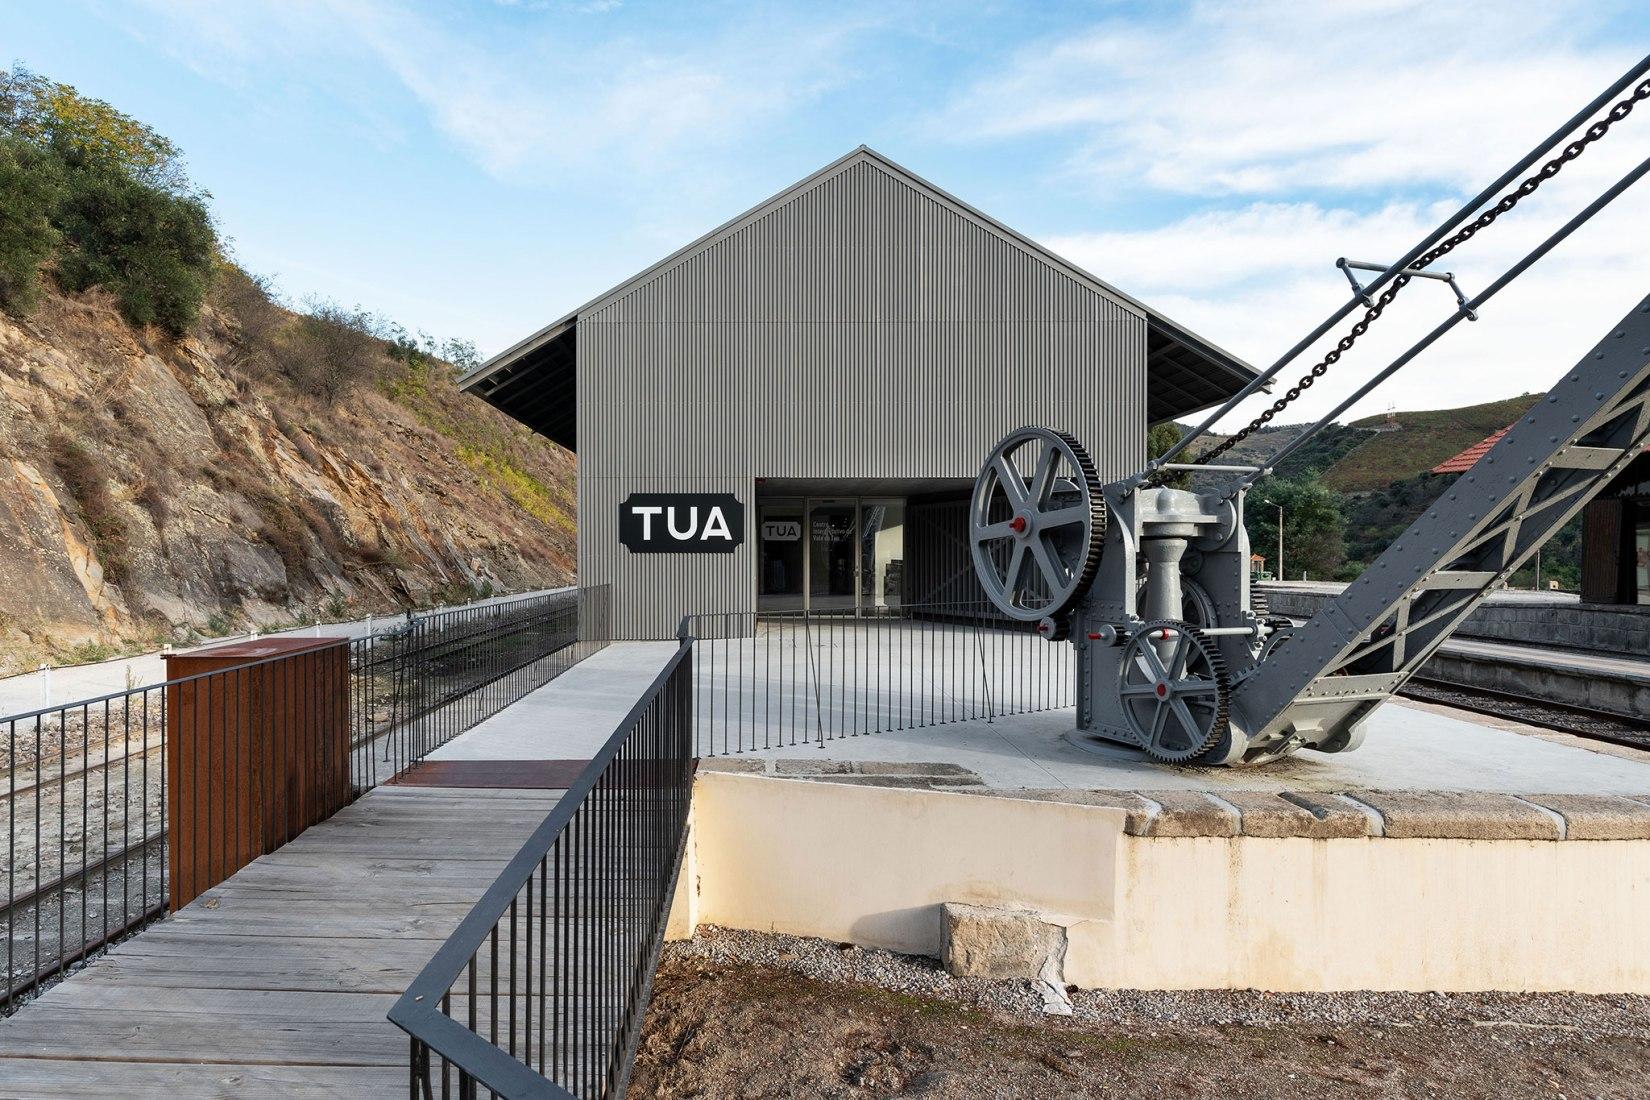 TUA Valley Interpretive Centre by Rosmaninho+Azevedo Architects. Photograph by Luis Ferreira Alves